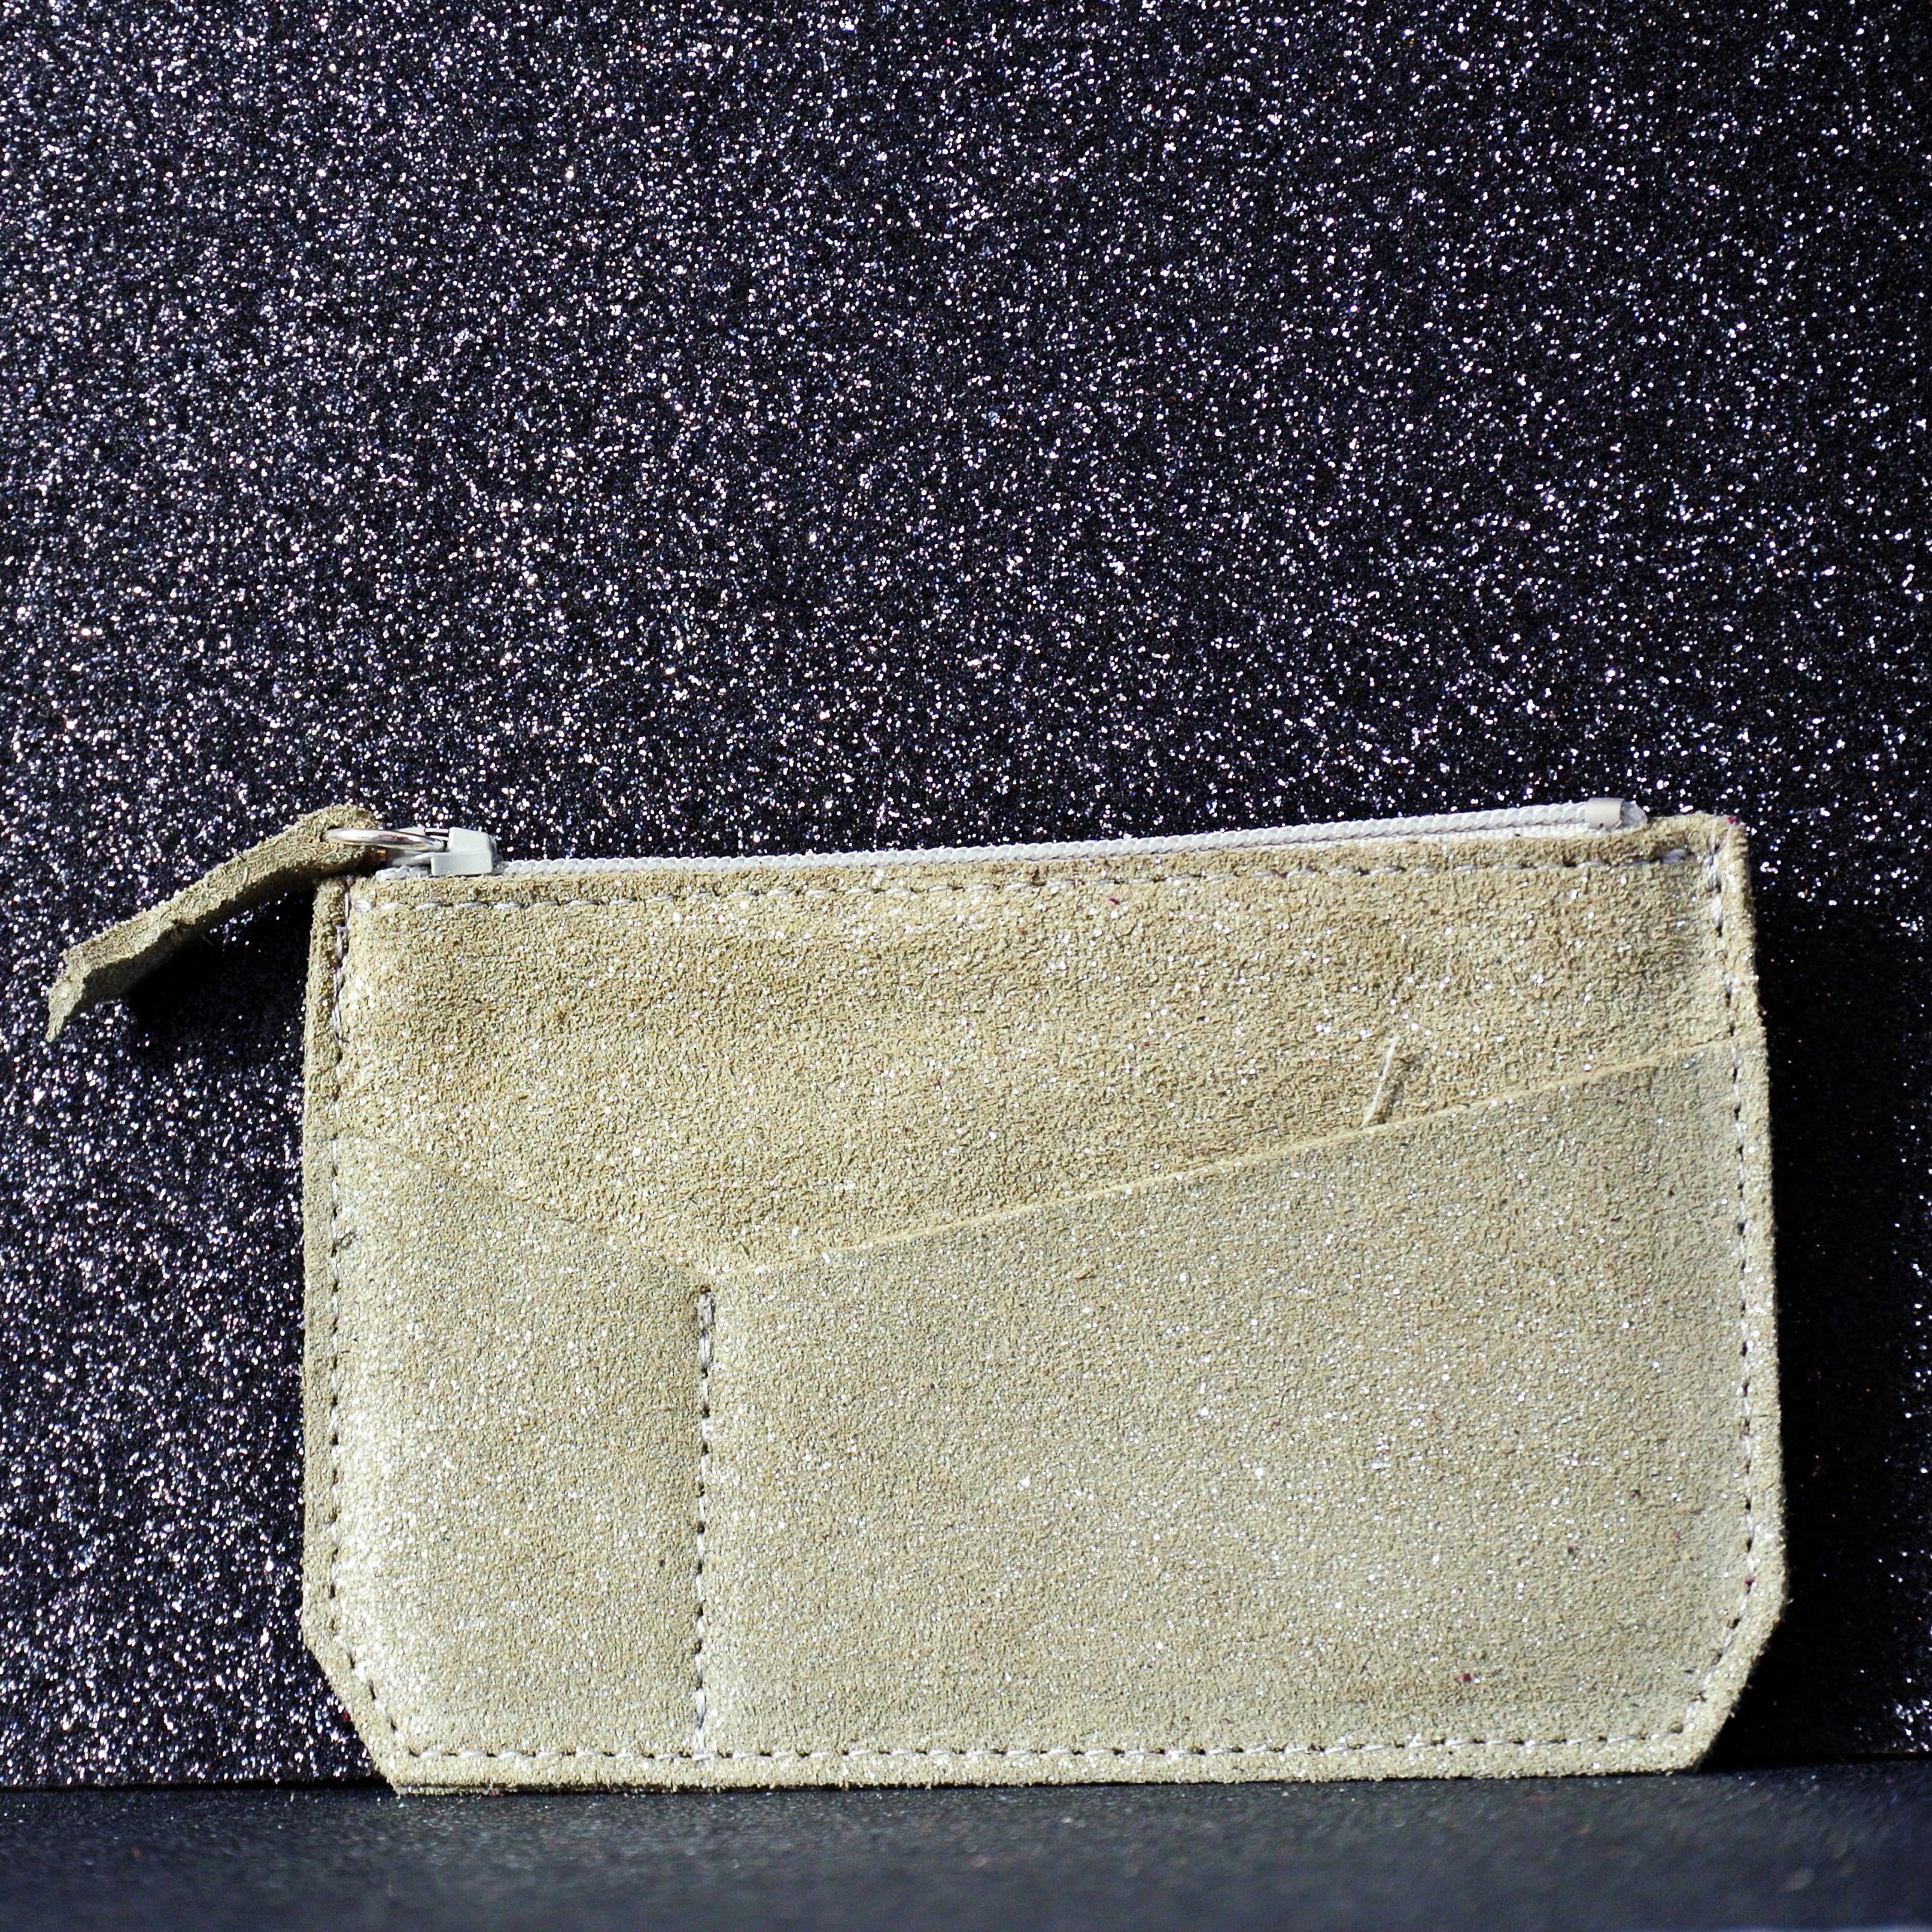 porte monnaie, mini v, en cuir, en cuir pailleté, made in france, la cartabliere